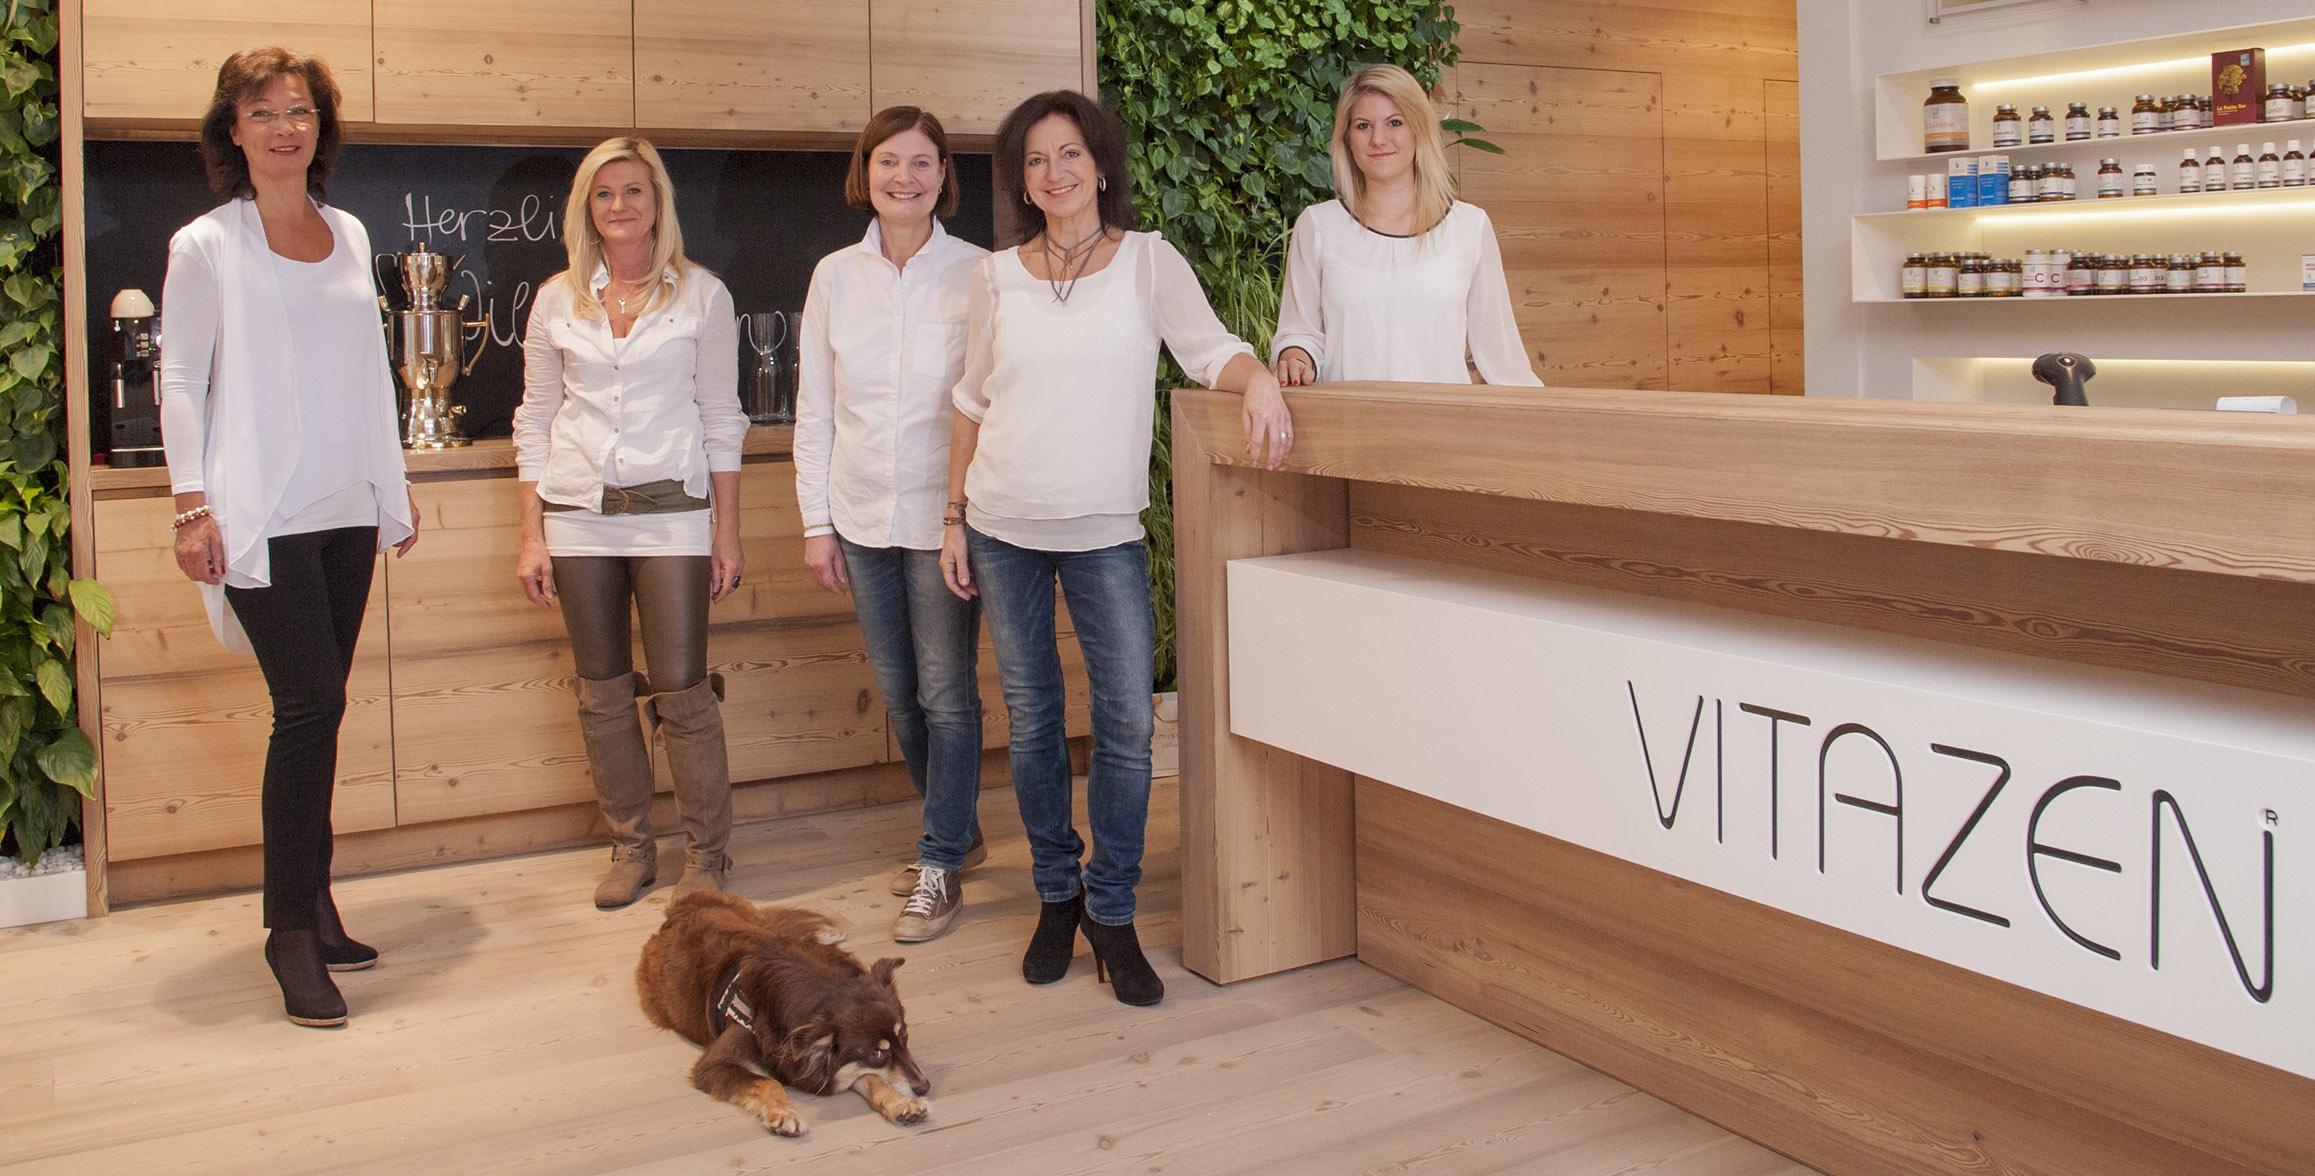 Team Vitazen